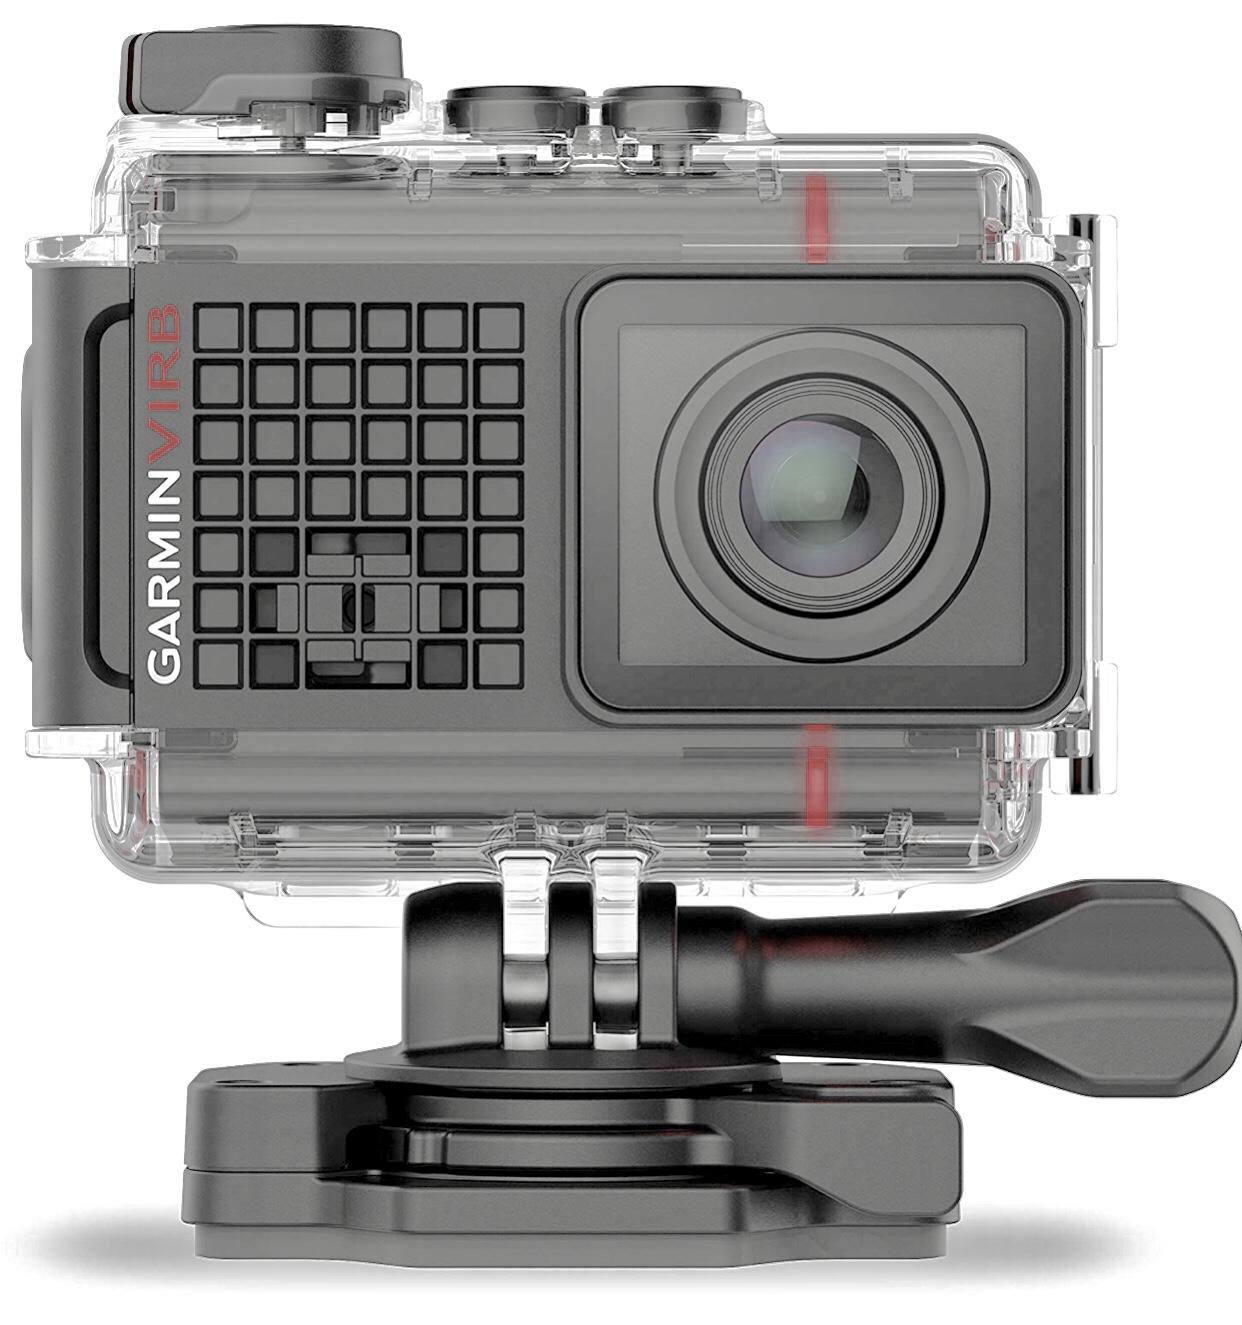 Garmin VIRB Ultra 30 Actionkamera – 4K-HD-Aufnahmen, G-Metrix, Touchscreen, Sprachsteuerung